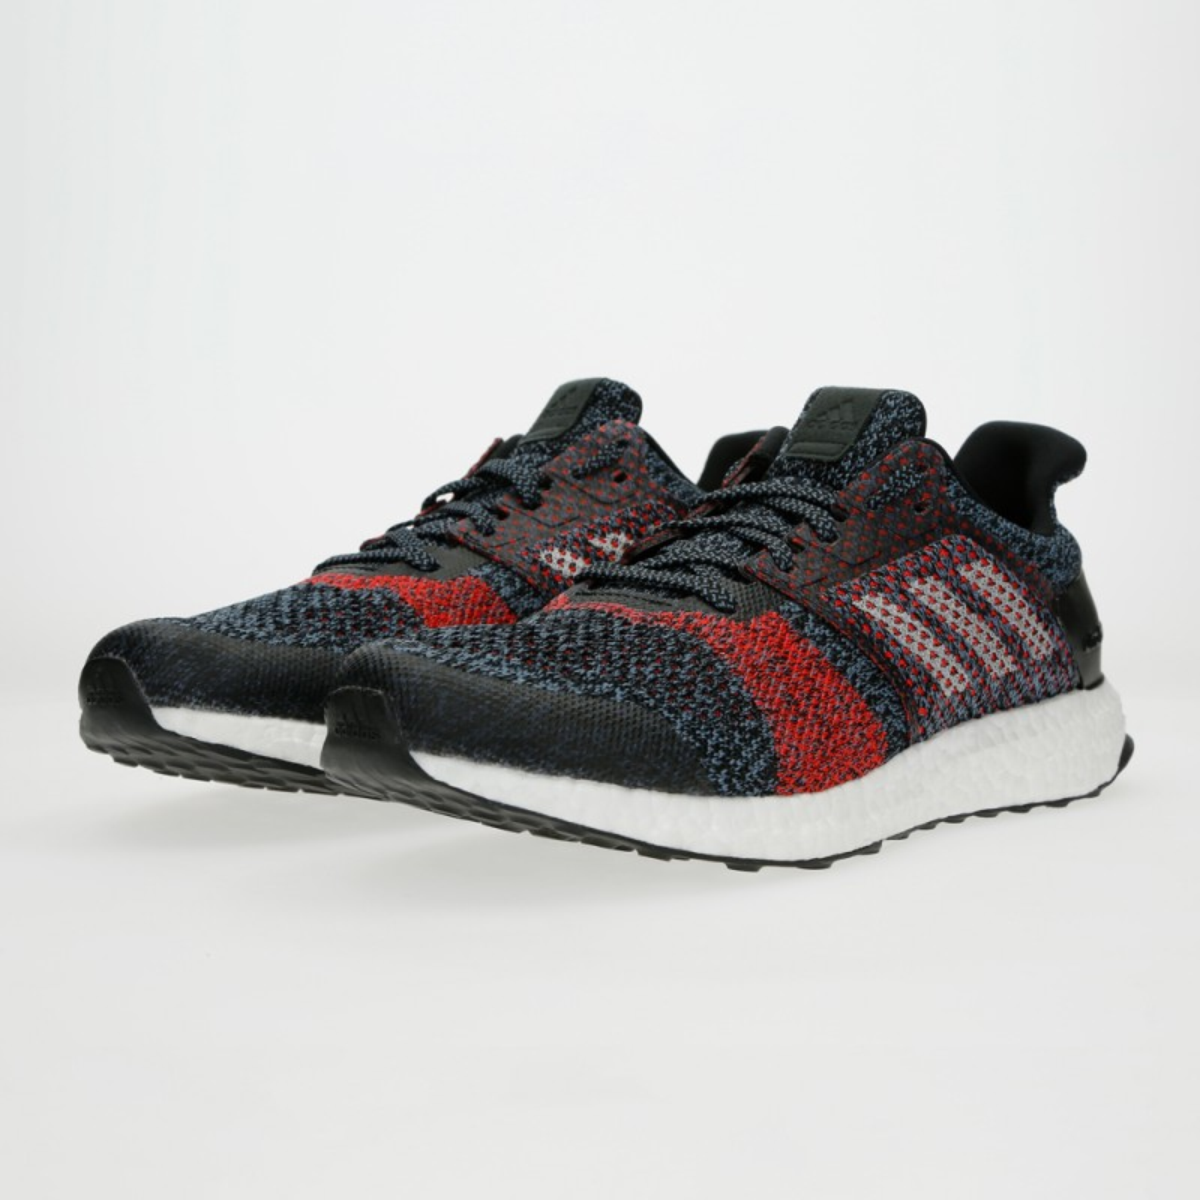 001a3d4f98264 ... Zapatillas Adidas Ultra Boost ST OI18 Azul Negro y Rojo Hombre ...